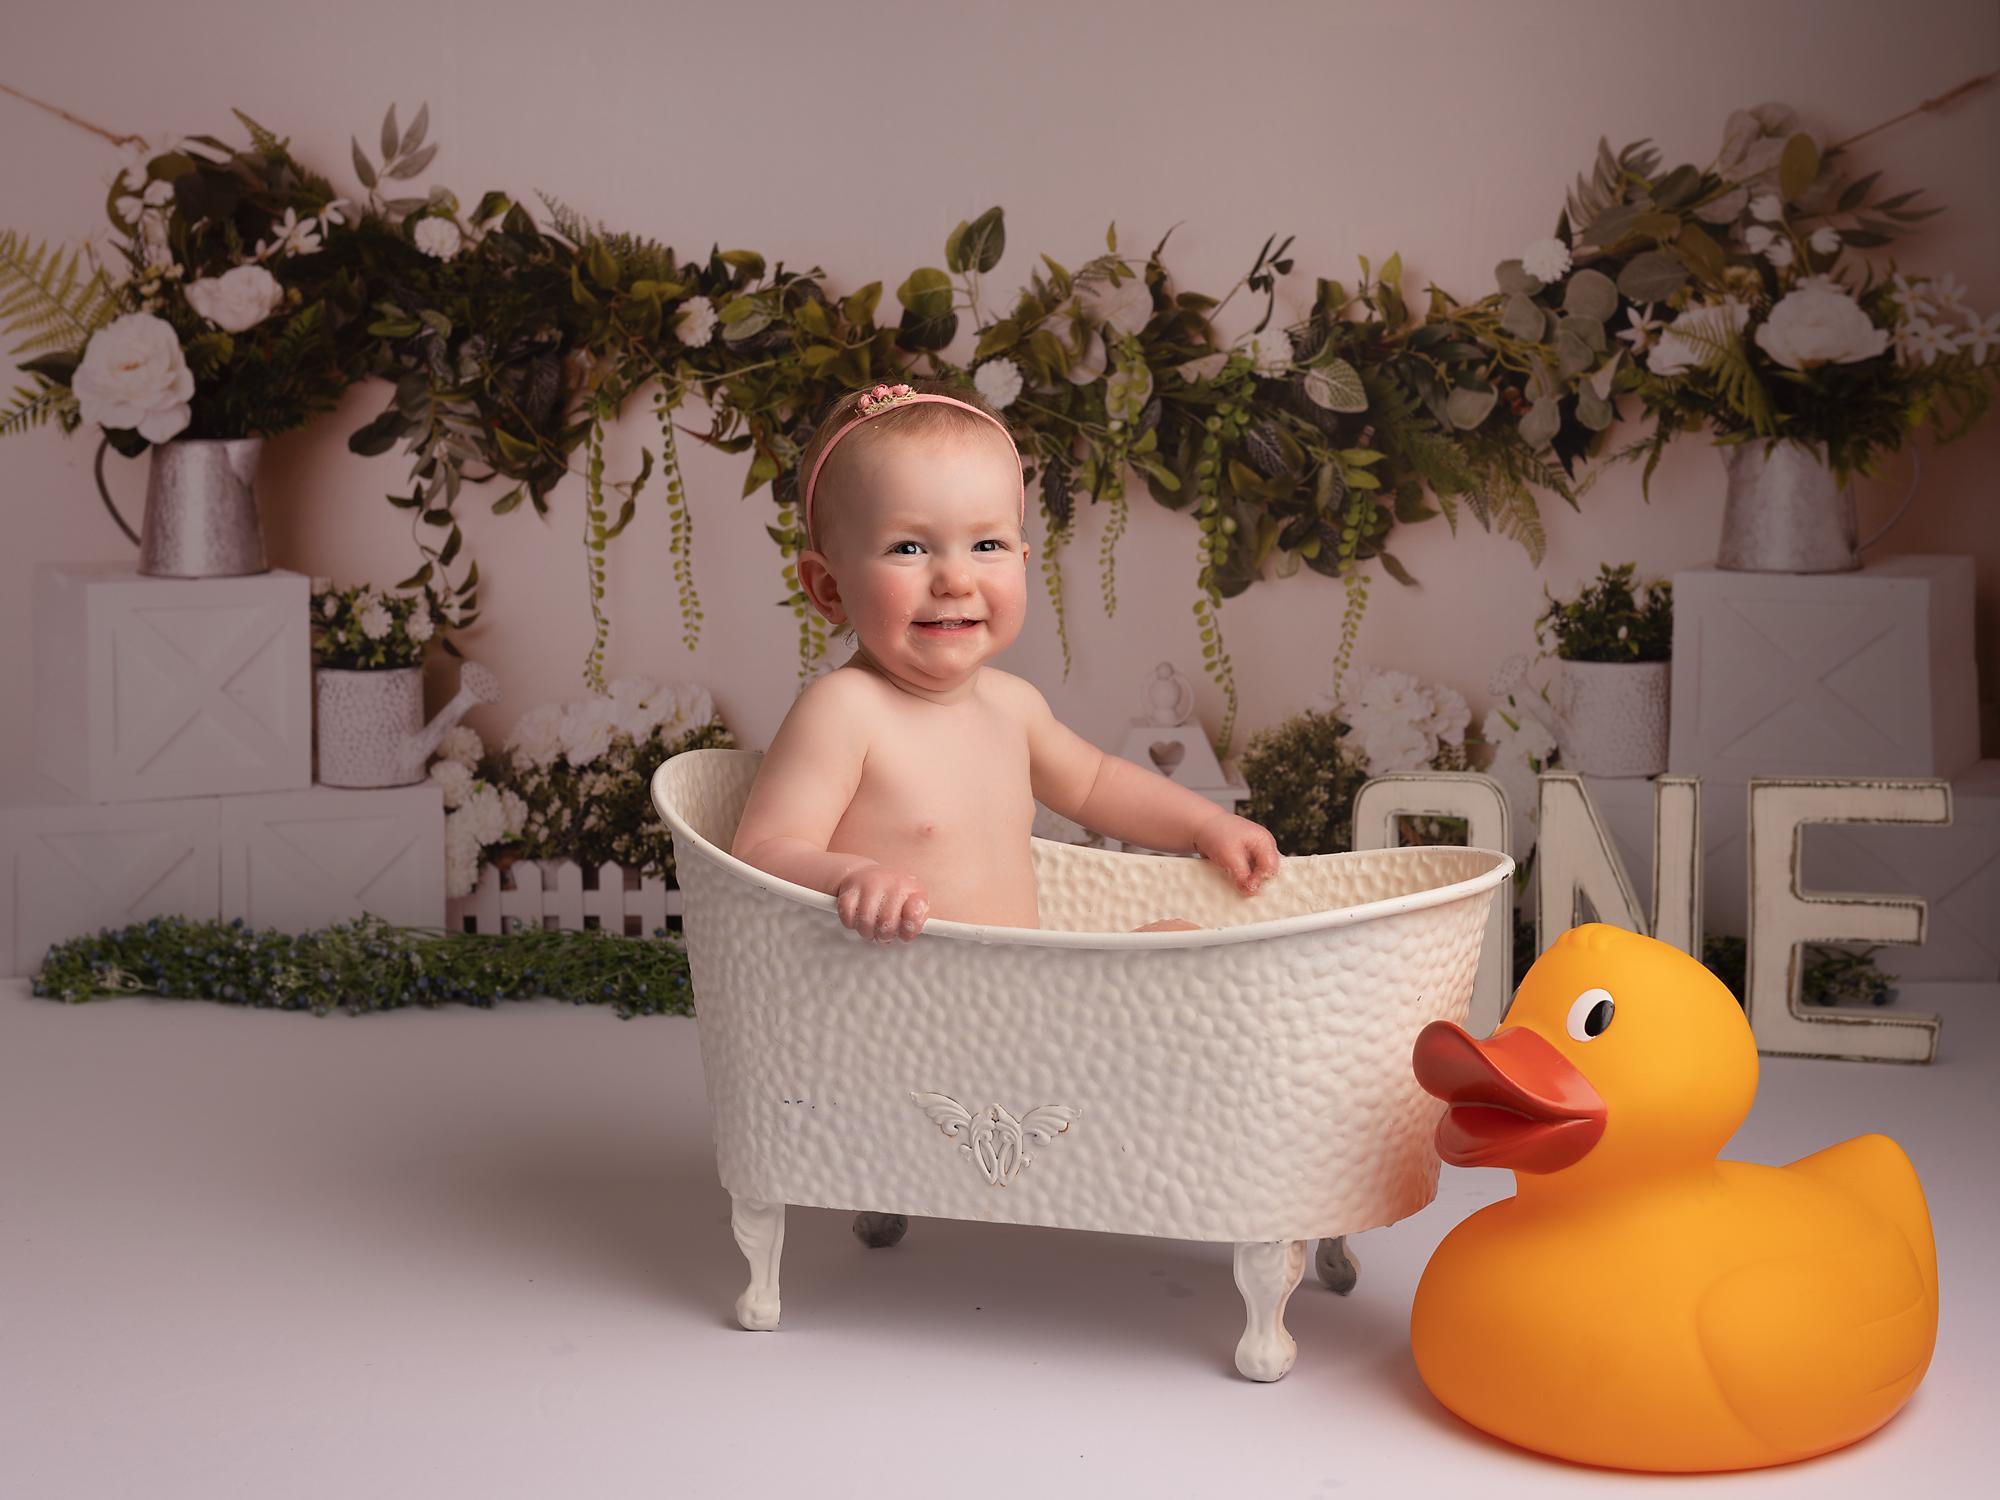 little girl in bath tub during her splash session